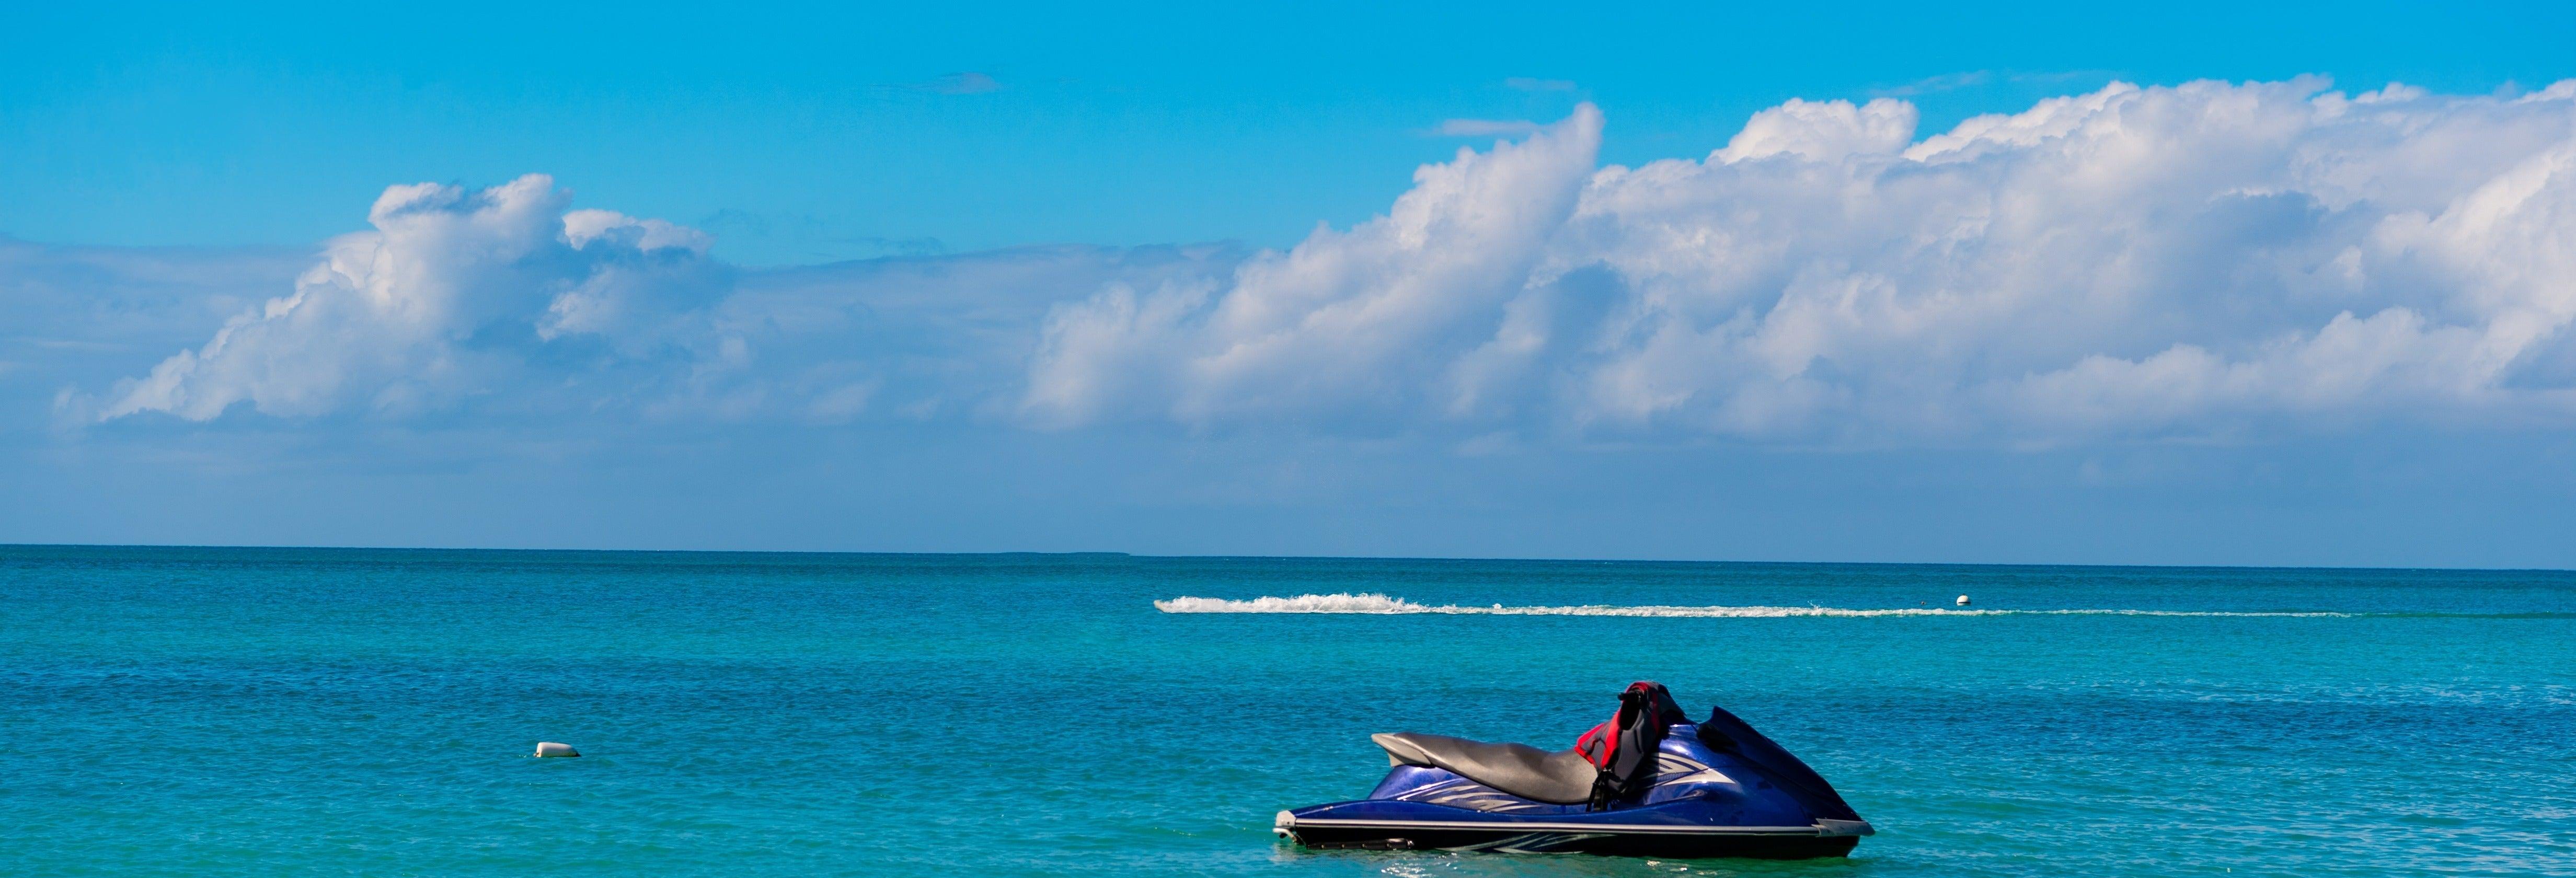 Noleggio moto d'acqua a Miami